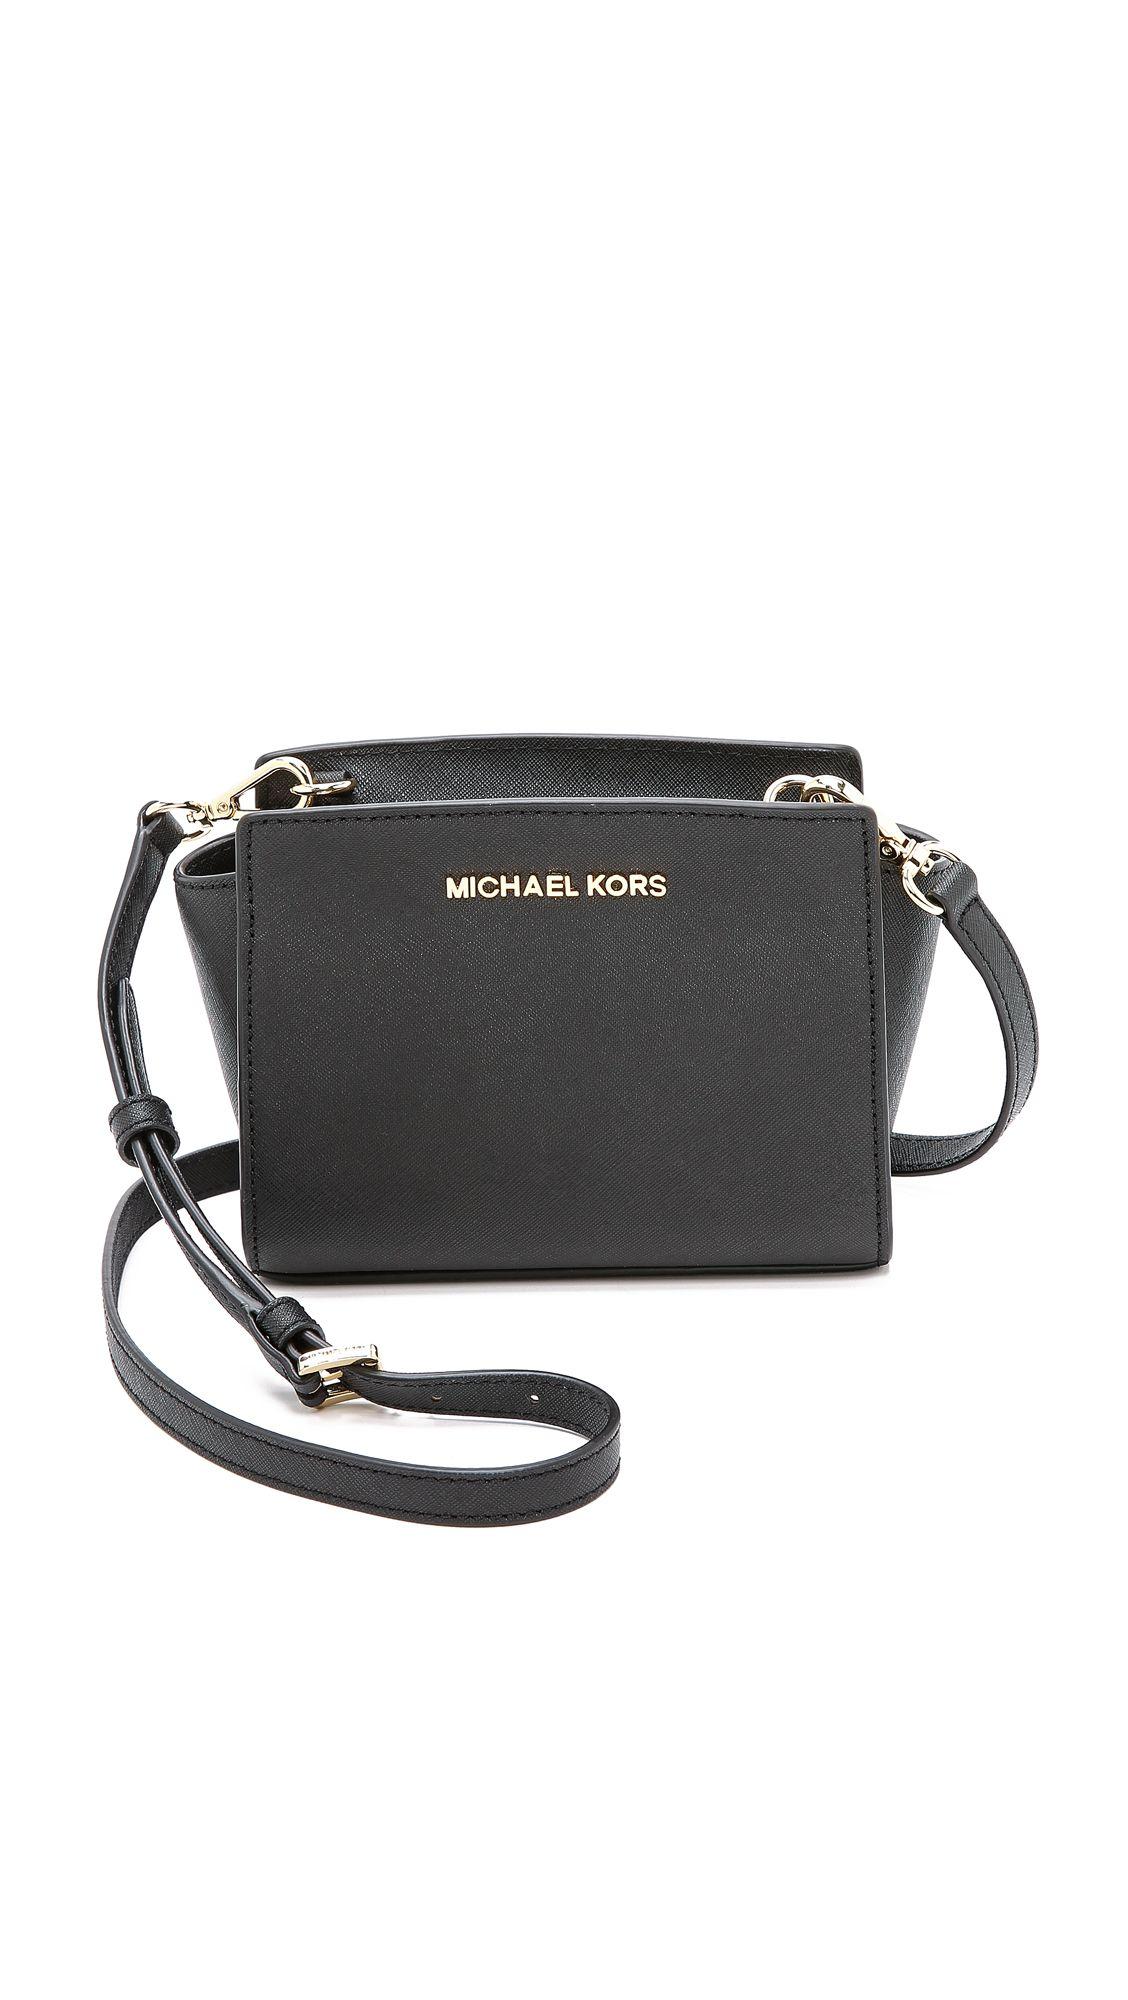 bd130d12688 Michael Michael Kors Selma Mini Messenger Bag - Black   SHOPBOP.COM saved  by  ShoppingIS